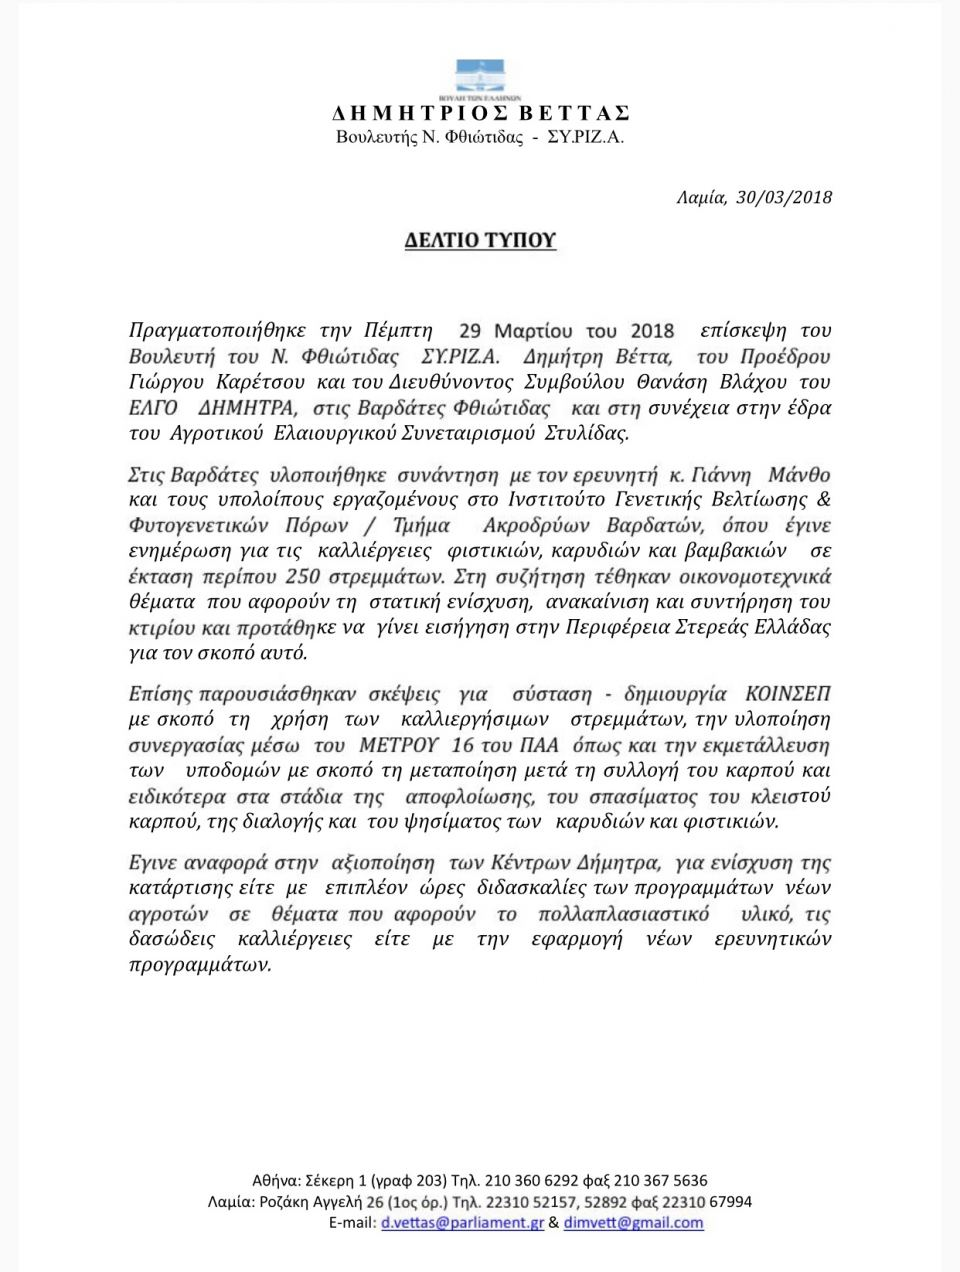 img 2657 ΔΗΜΗΤΡΗΣ ΒΕΤΤΑΣ